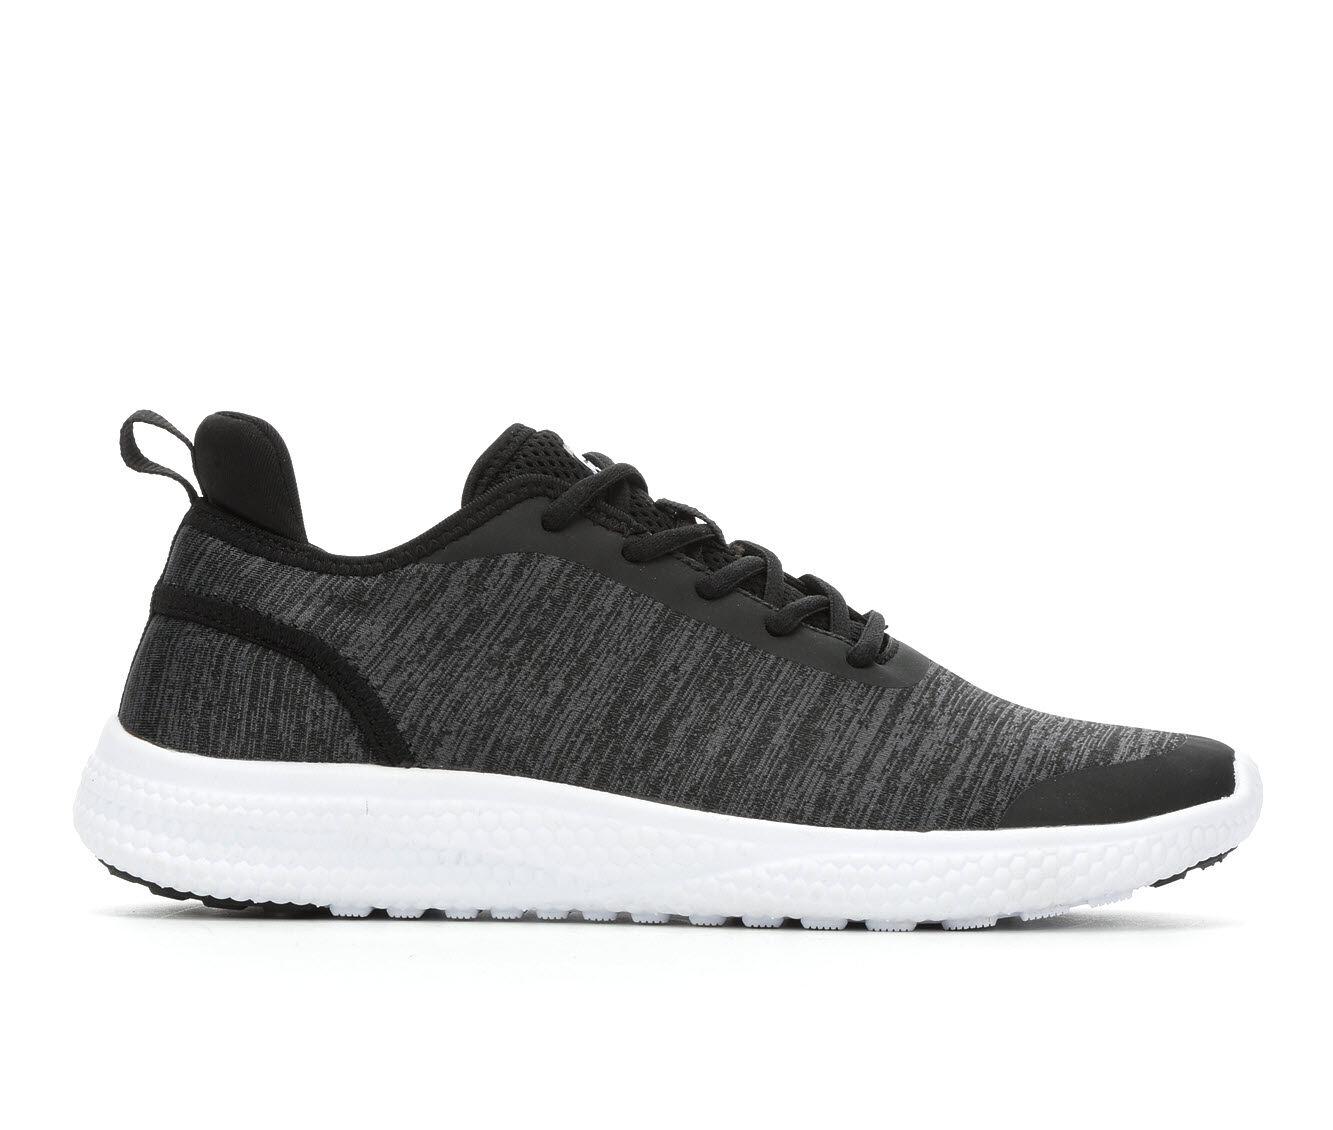 Women's Fabletics Voyage Slip-On Sneakers Black/White